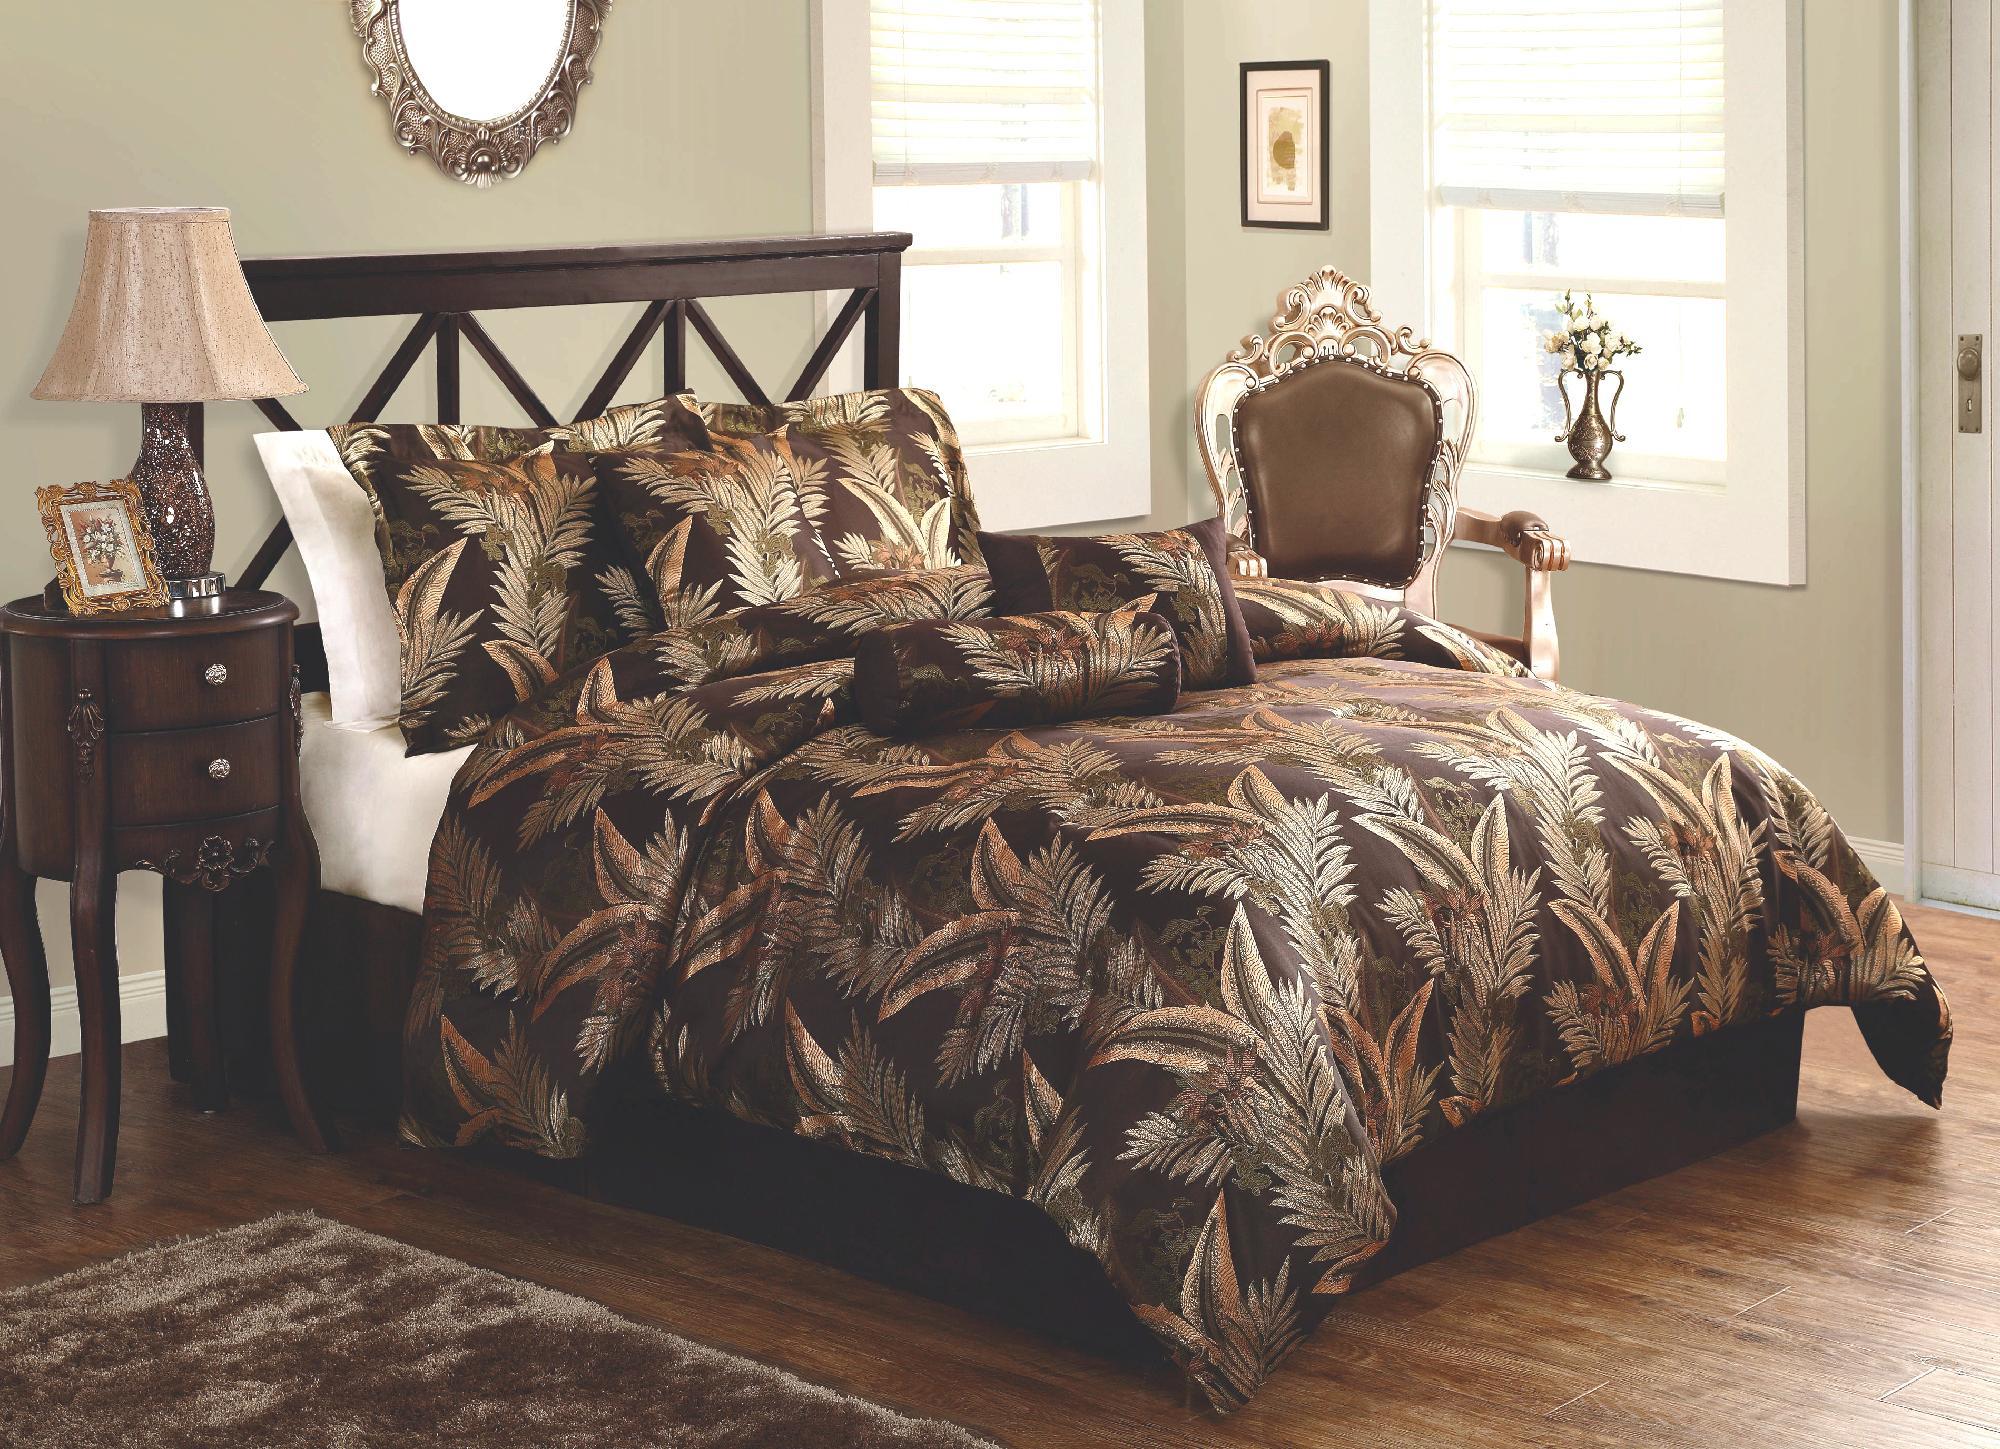 LifeStyles Palms Comforter Set with Bonus Pillows